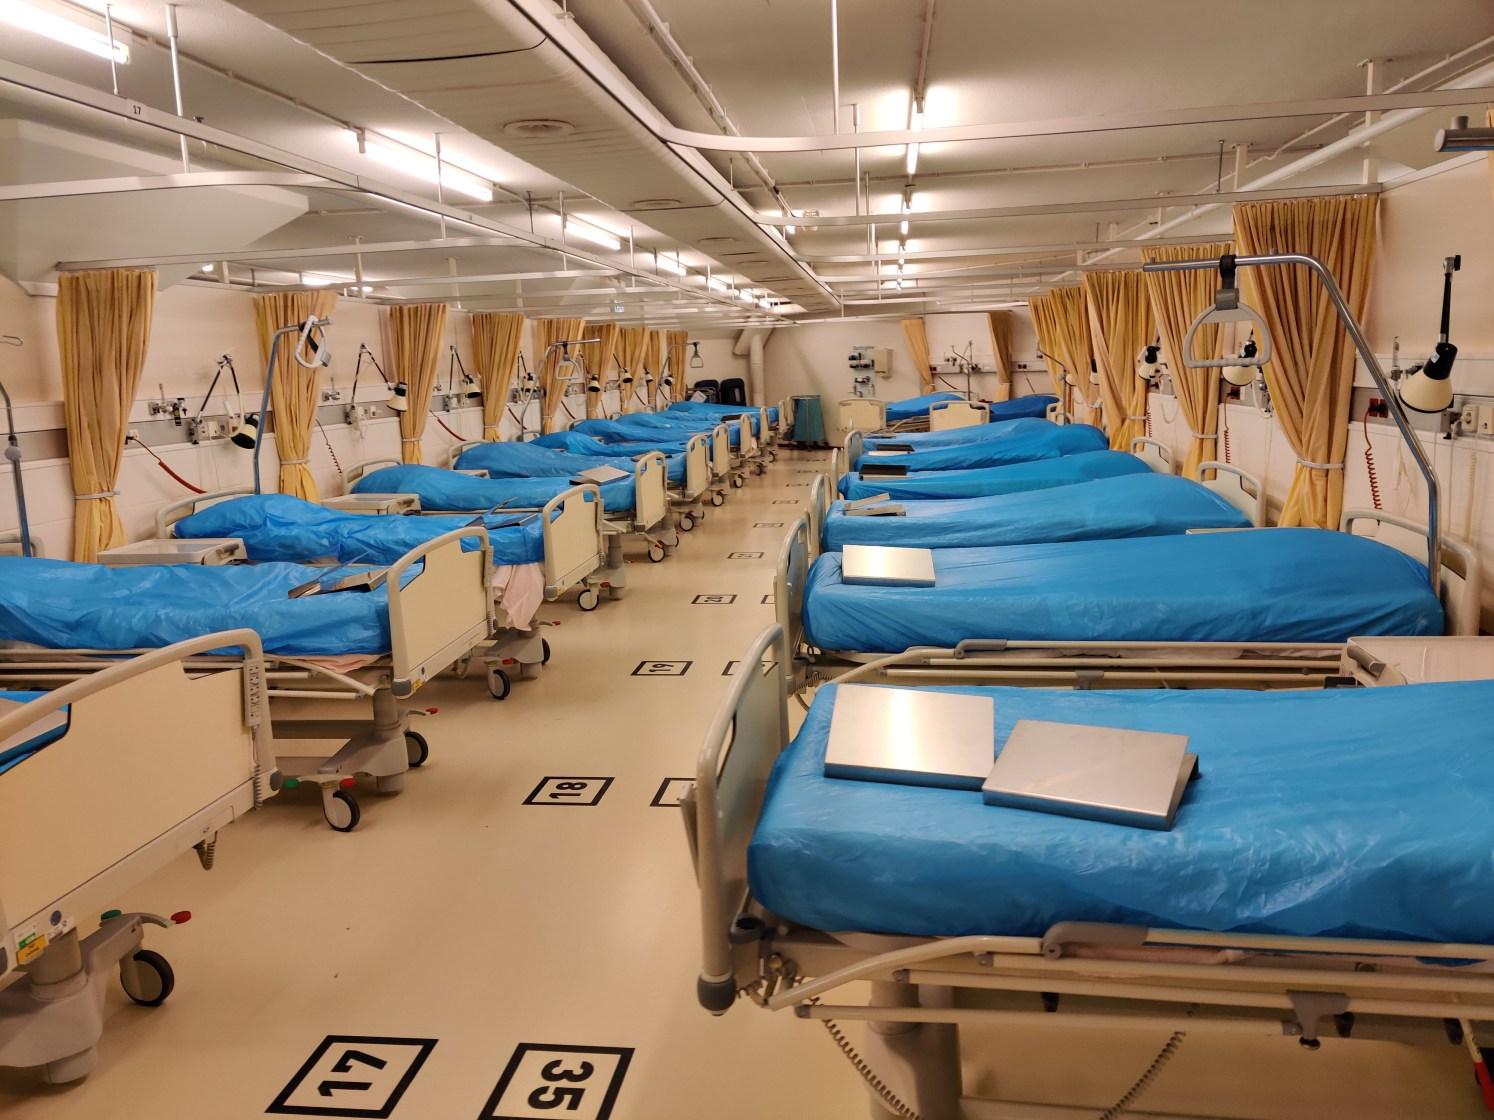 Centraal Militair Hospitaal / Calamiteitenhospitaal